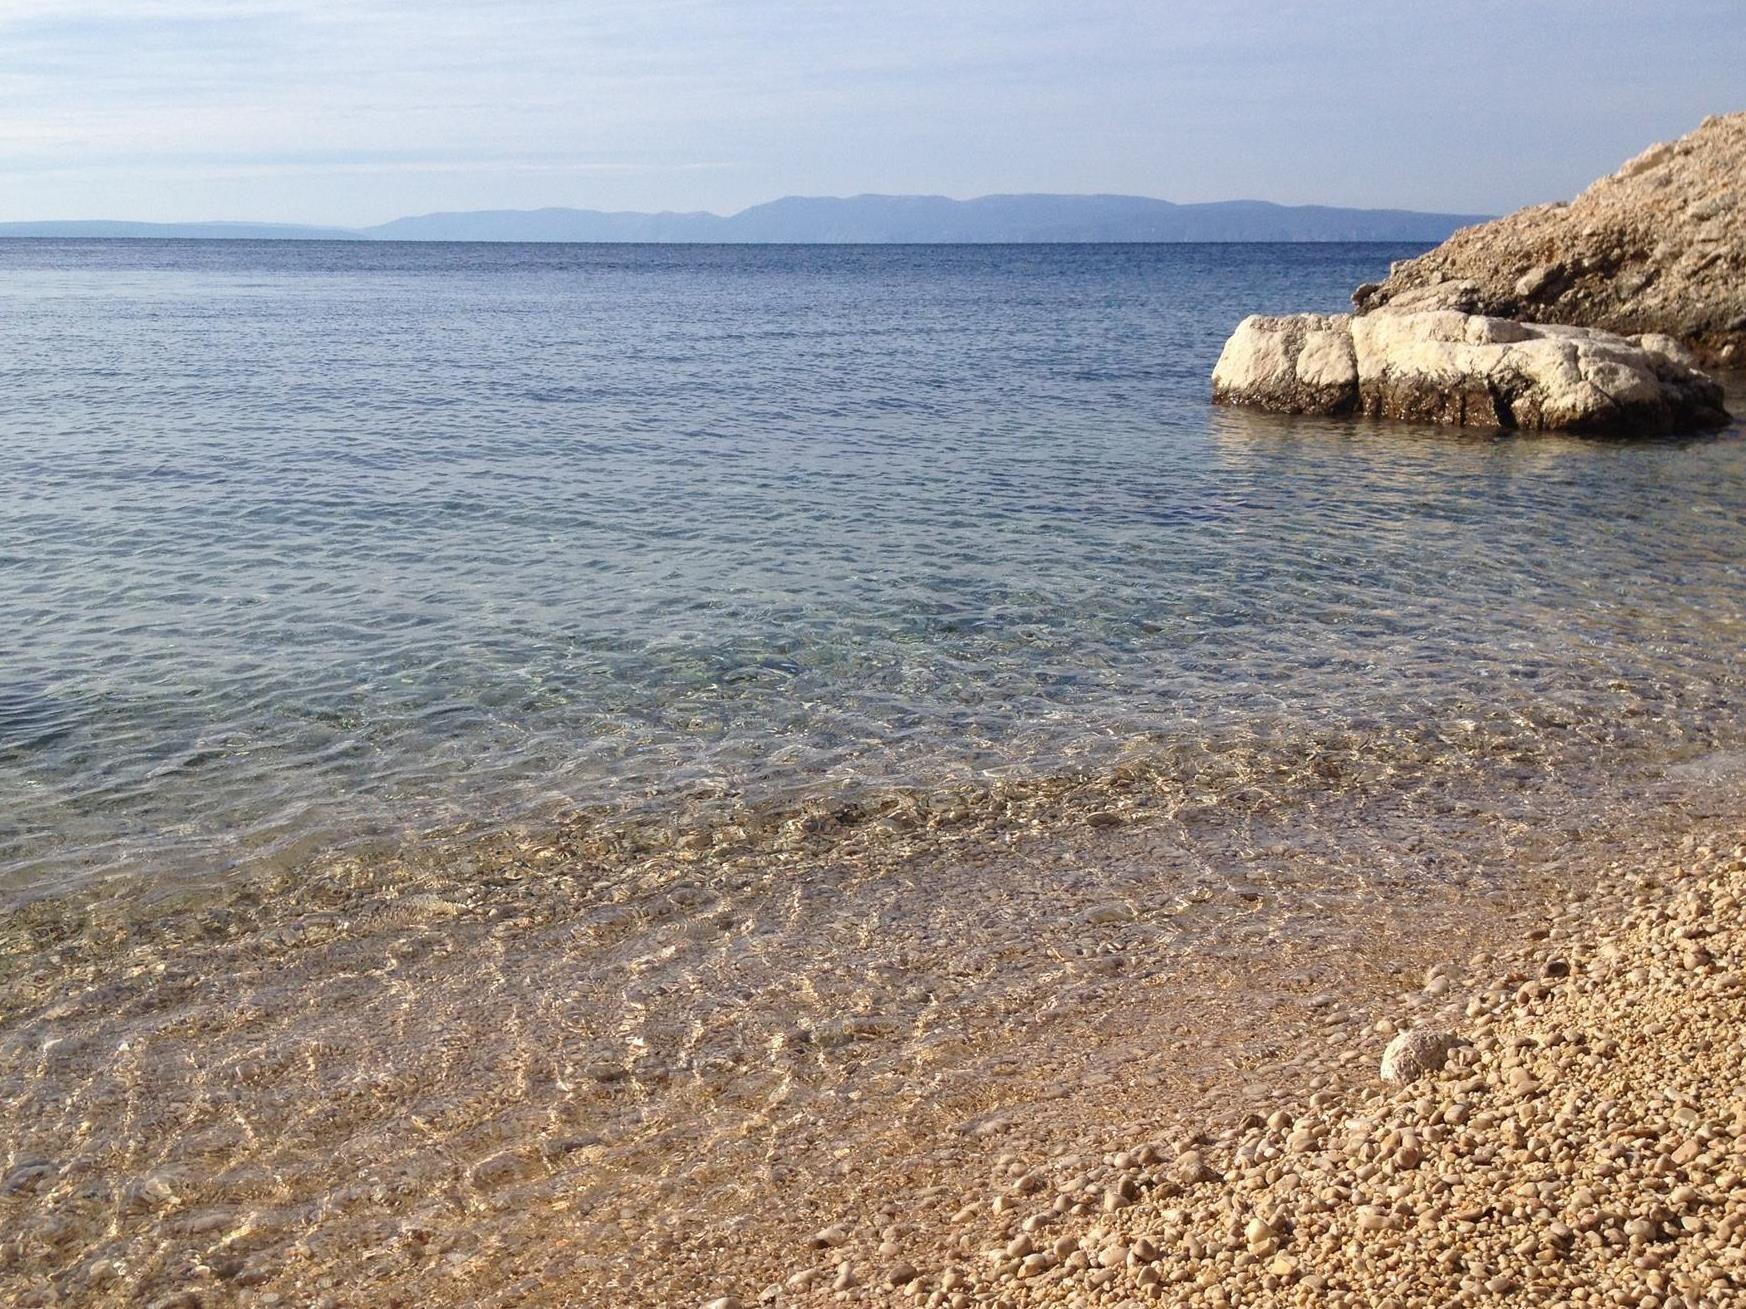 Baroniurlaub - Kostrena in der Kvarner Bucht bei Rijeka in Kroatien